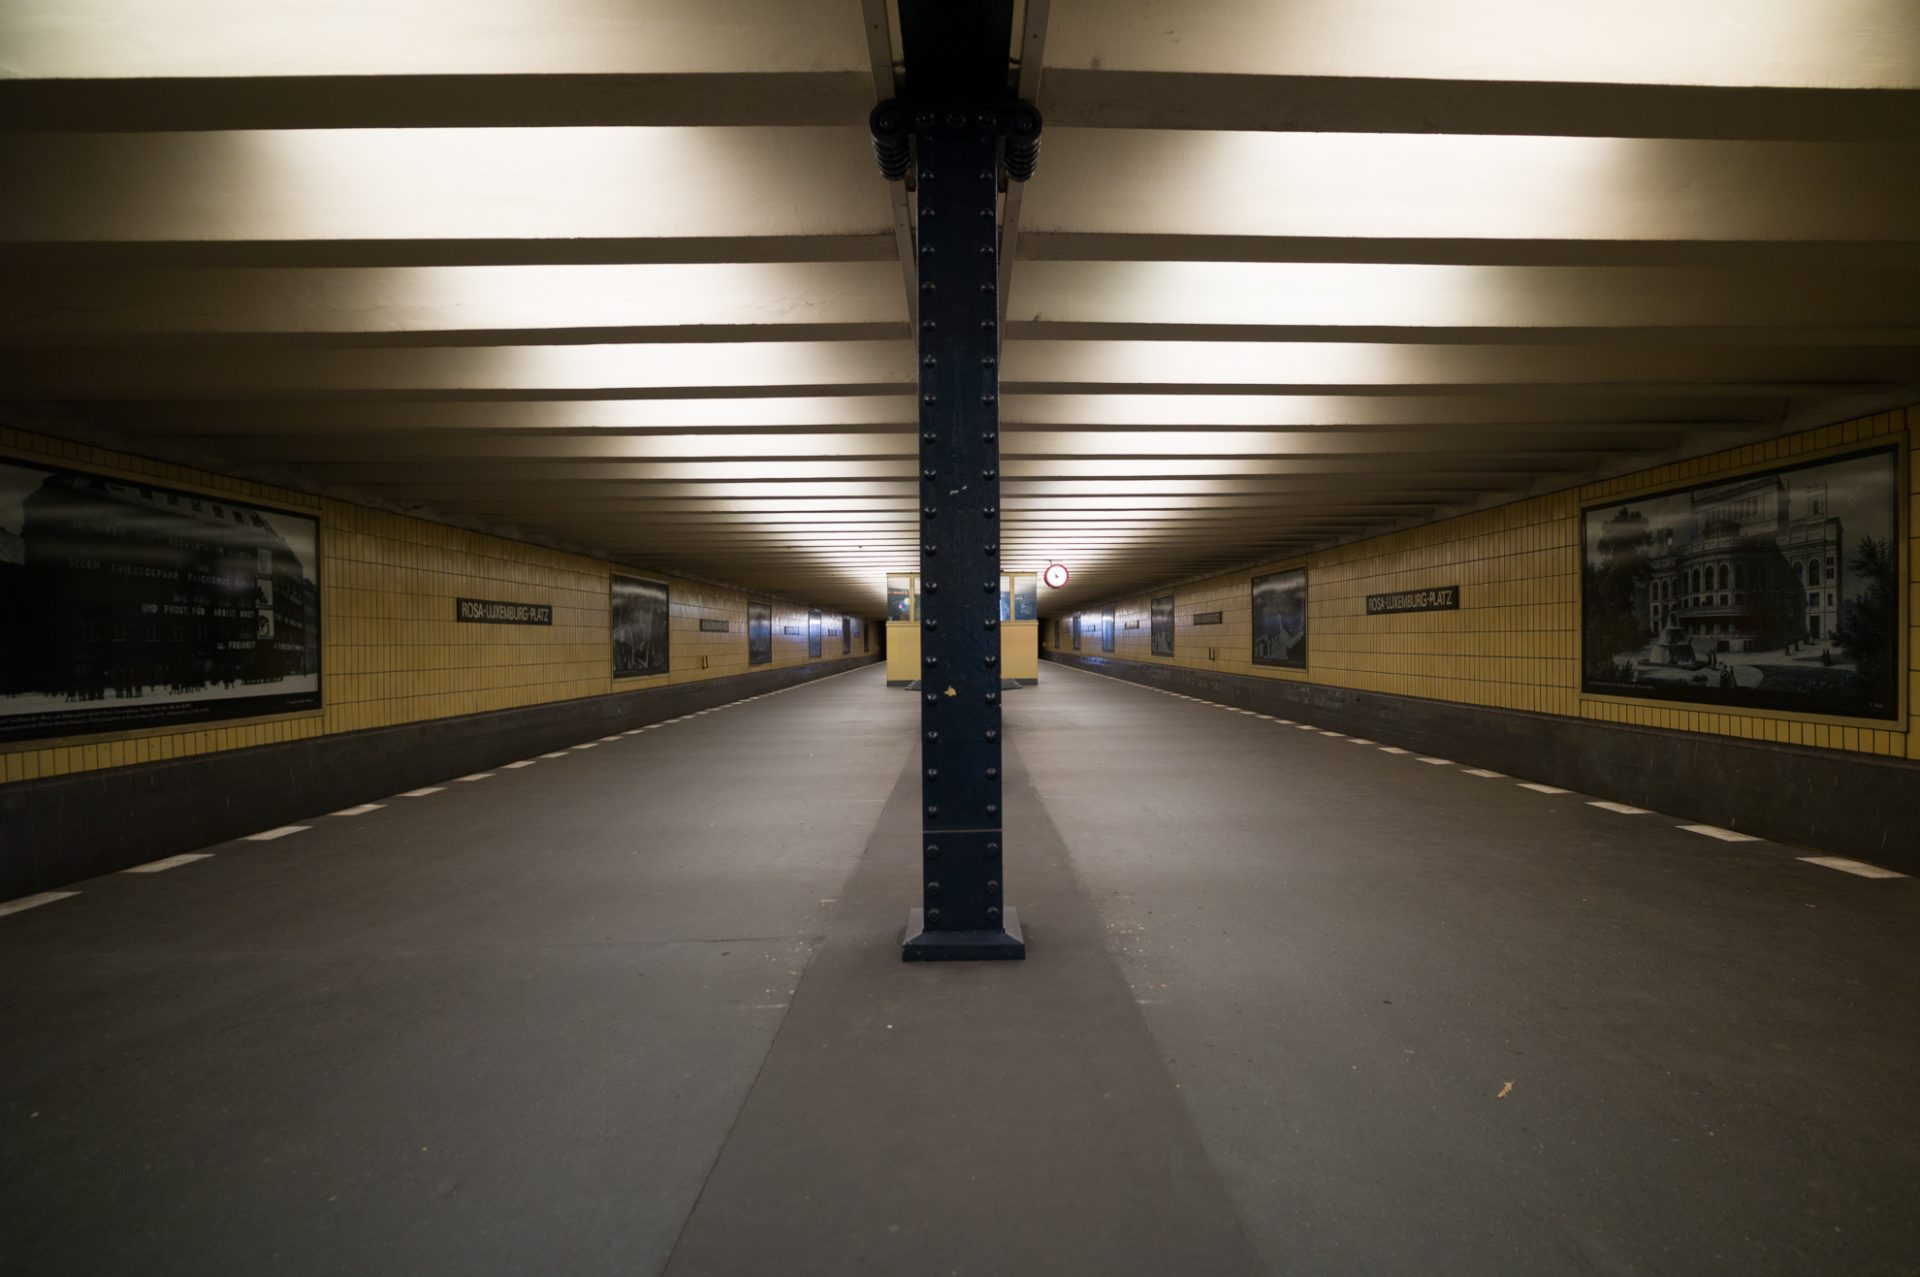 u2_rosaluxemburgplatz (3 von 5)